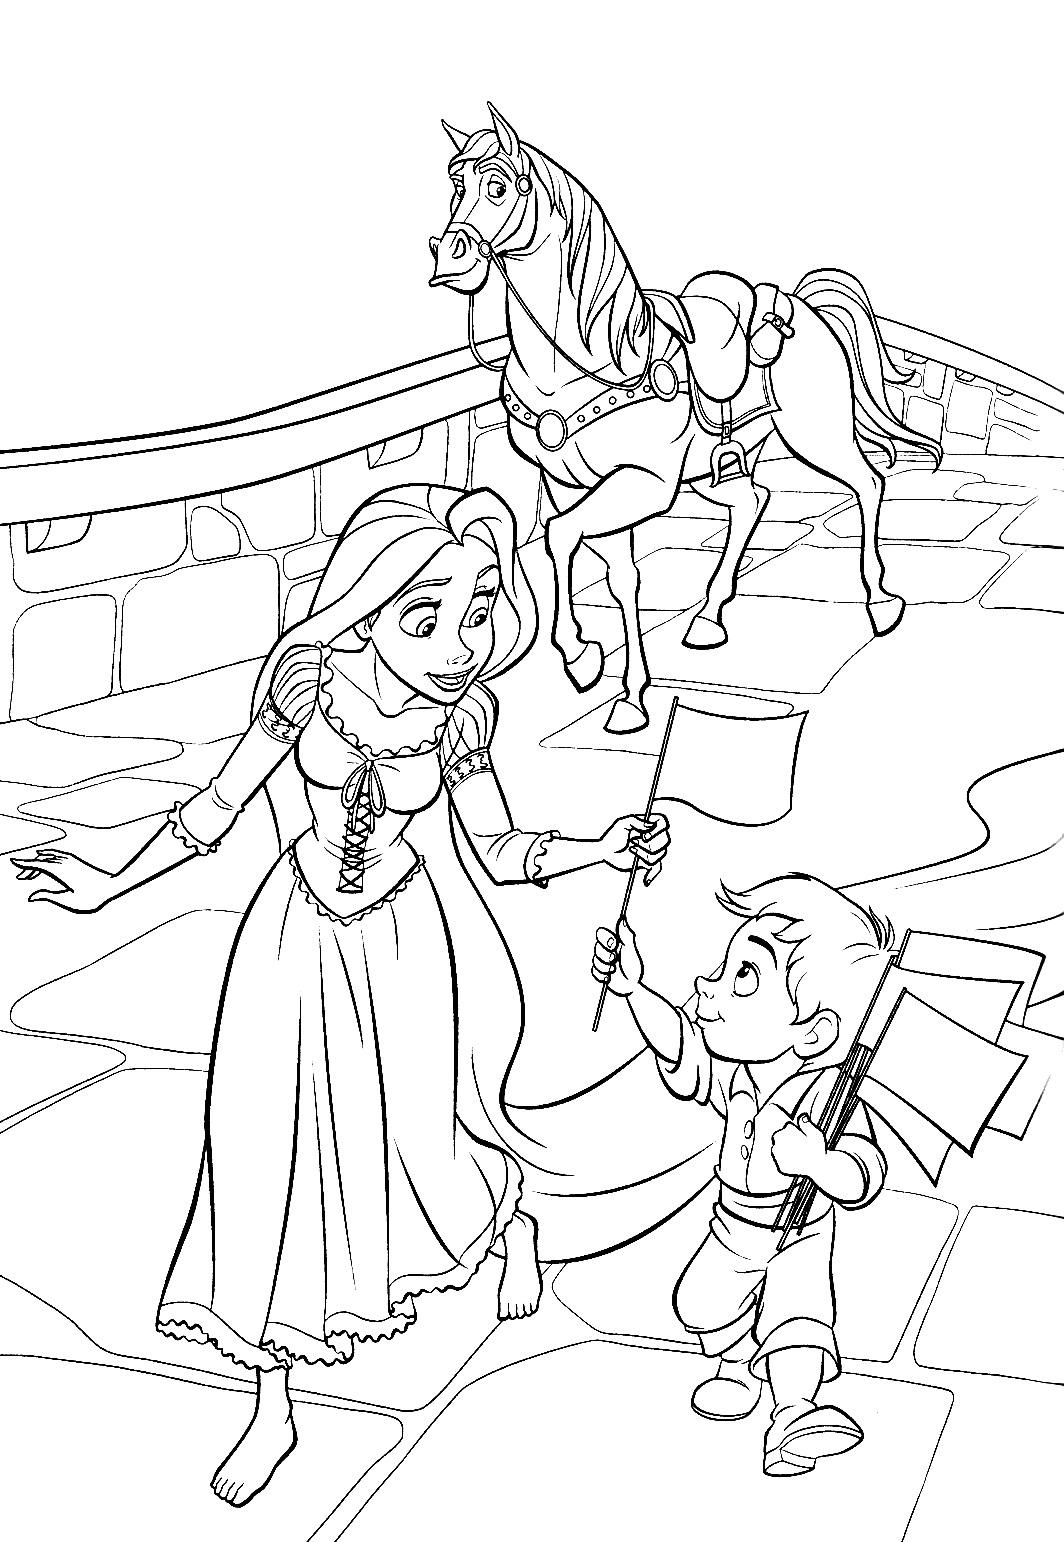 Desenhos De Enrolados Para Colorir Pintar Imprimir Rapunzel